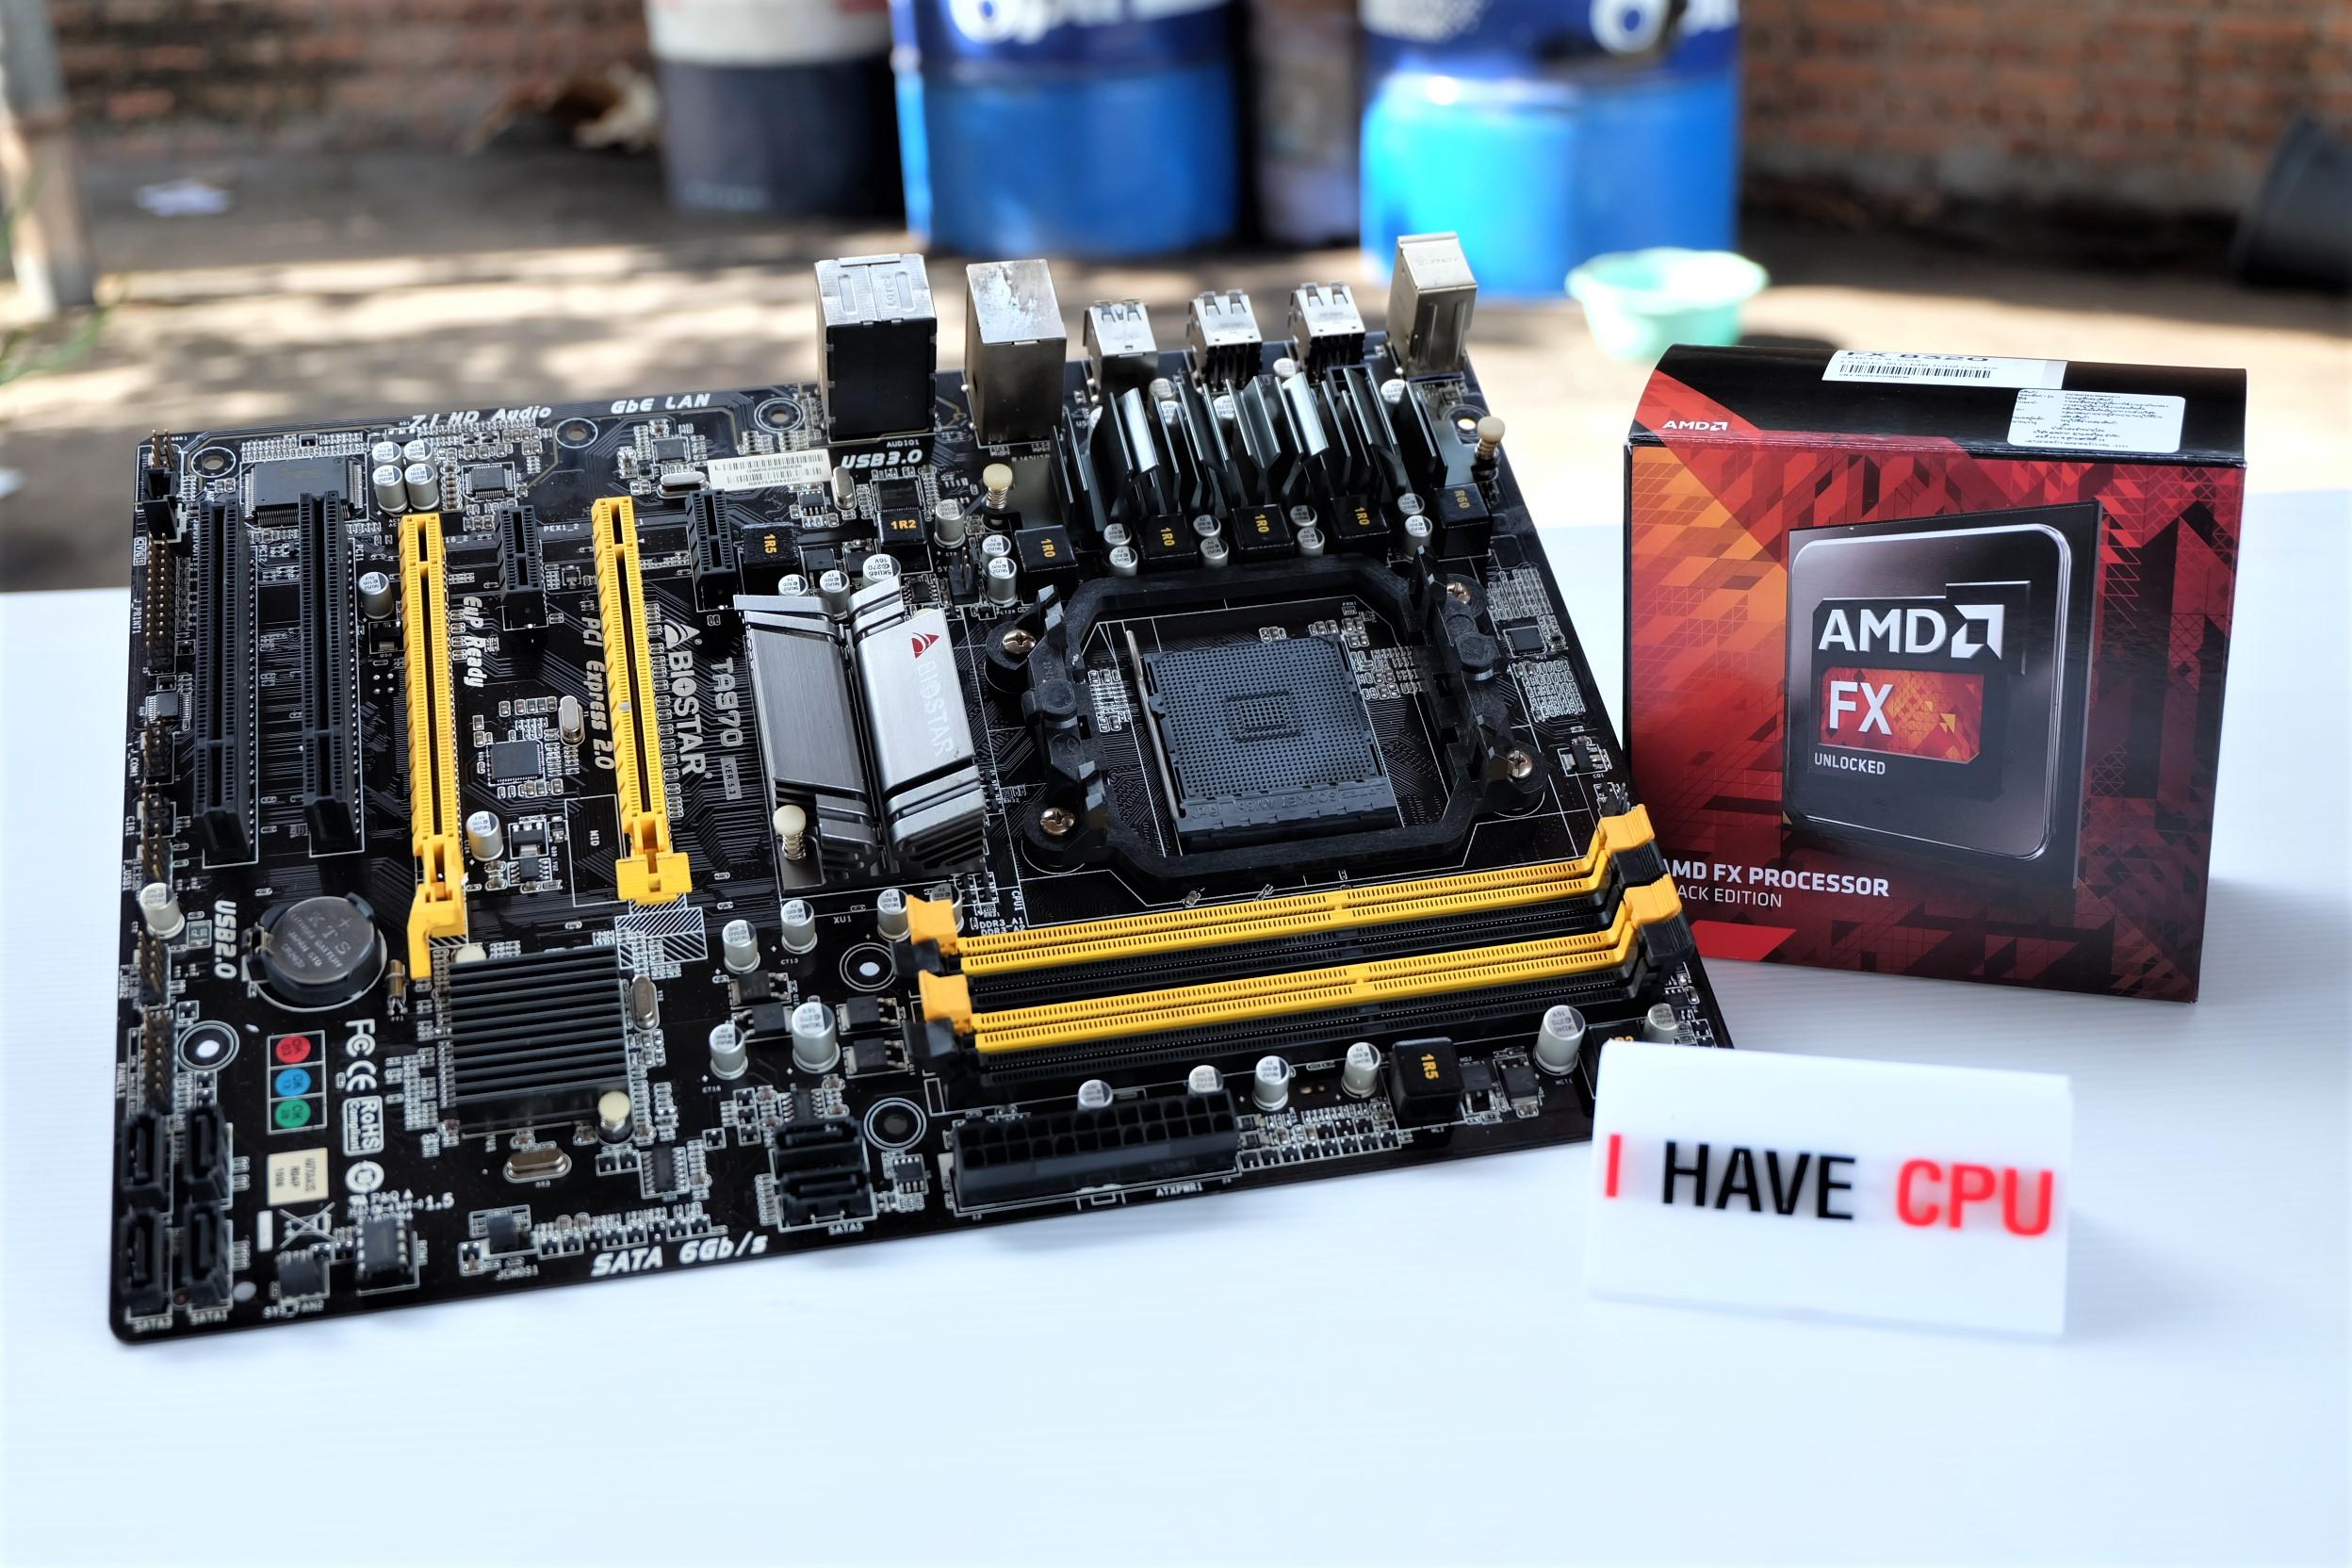 AMD FX 8320 3.5Ghz Turbo 4.0Ghz 8Core 8Thread (ของใหม่) + Biostar TA970